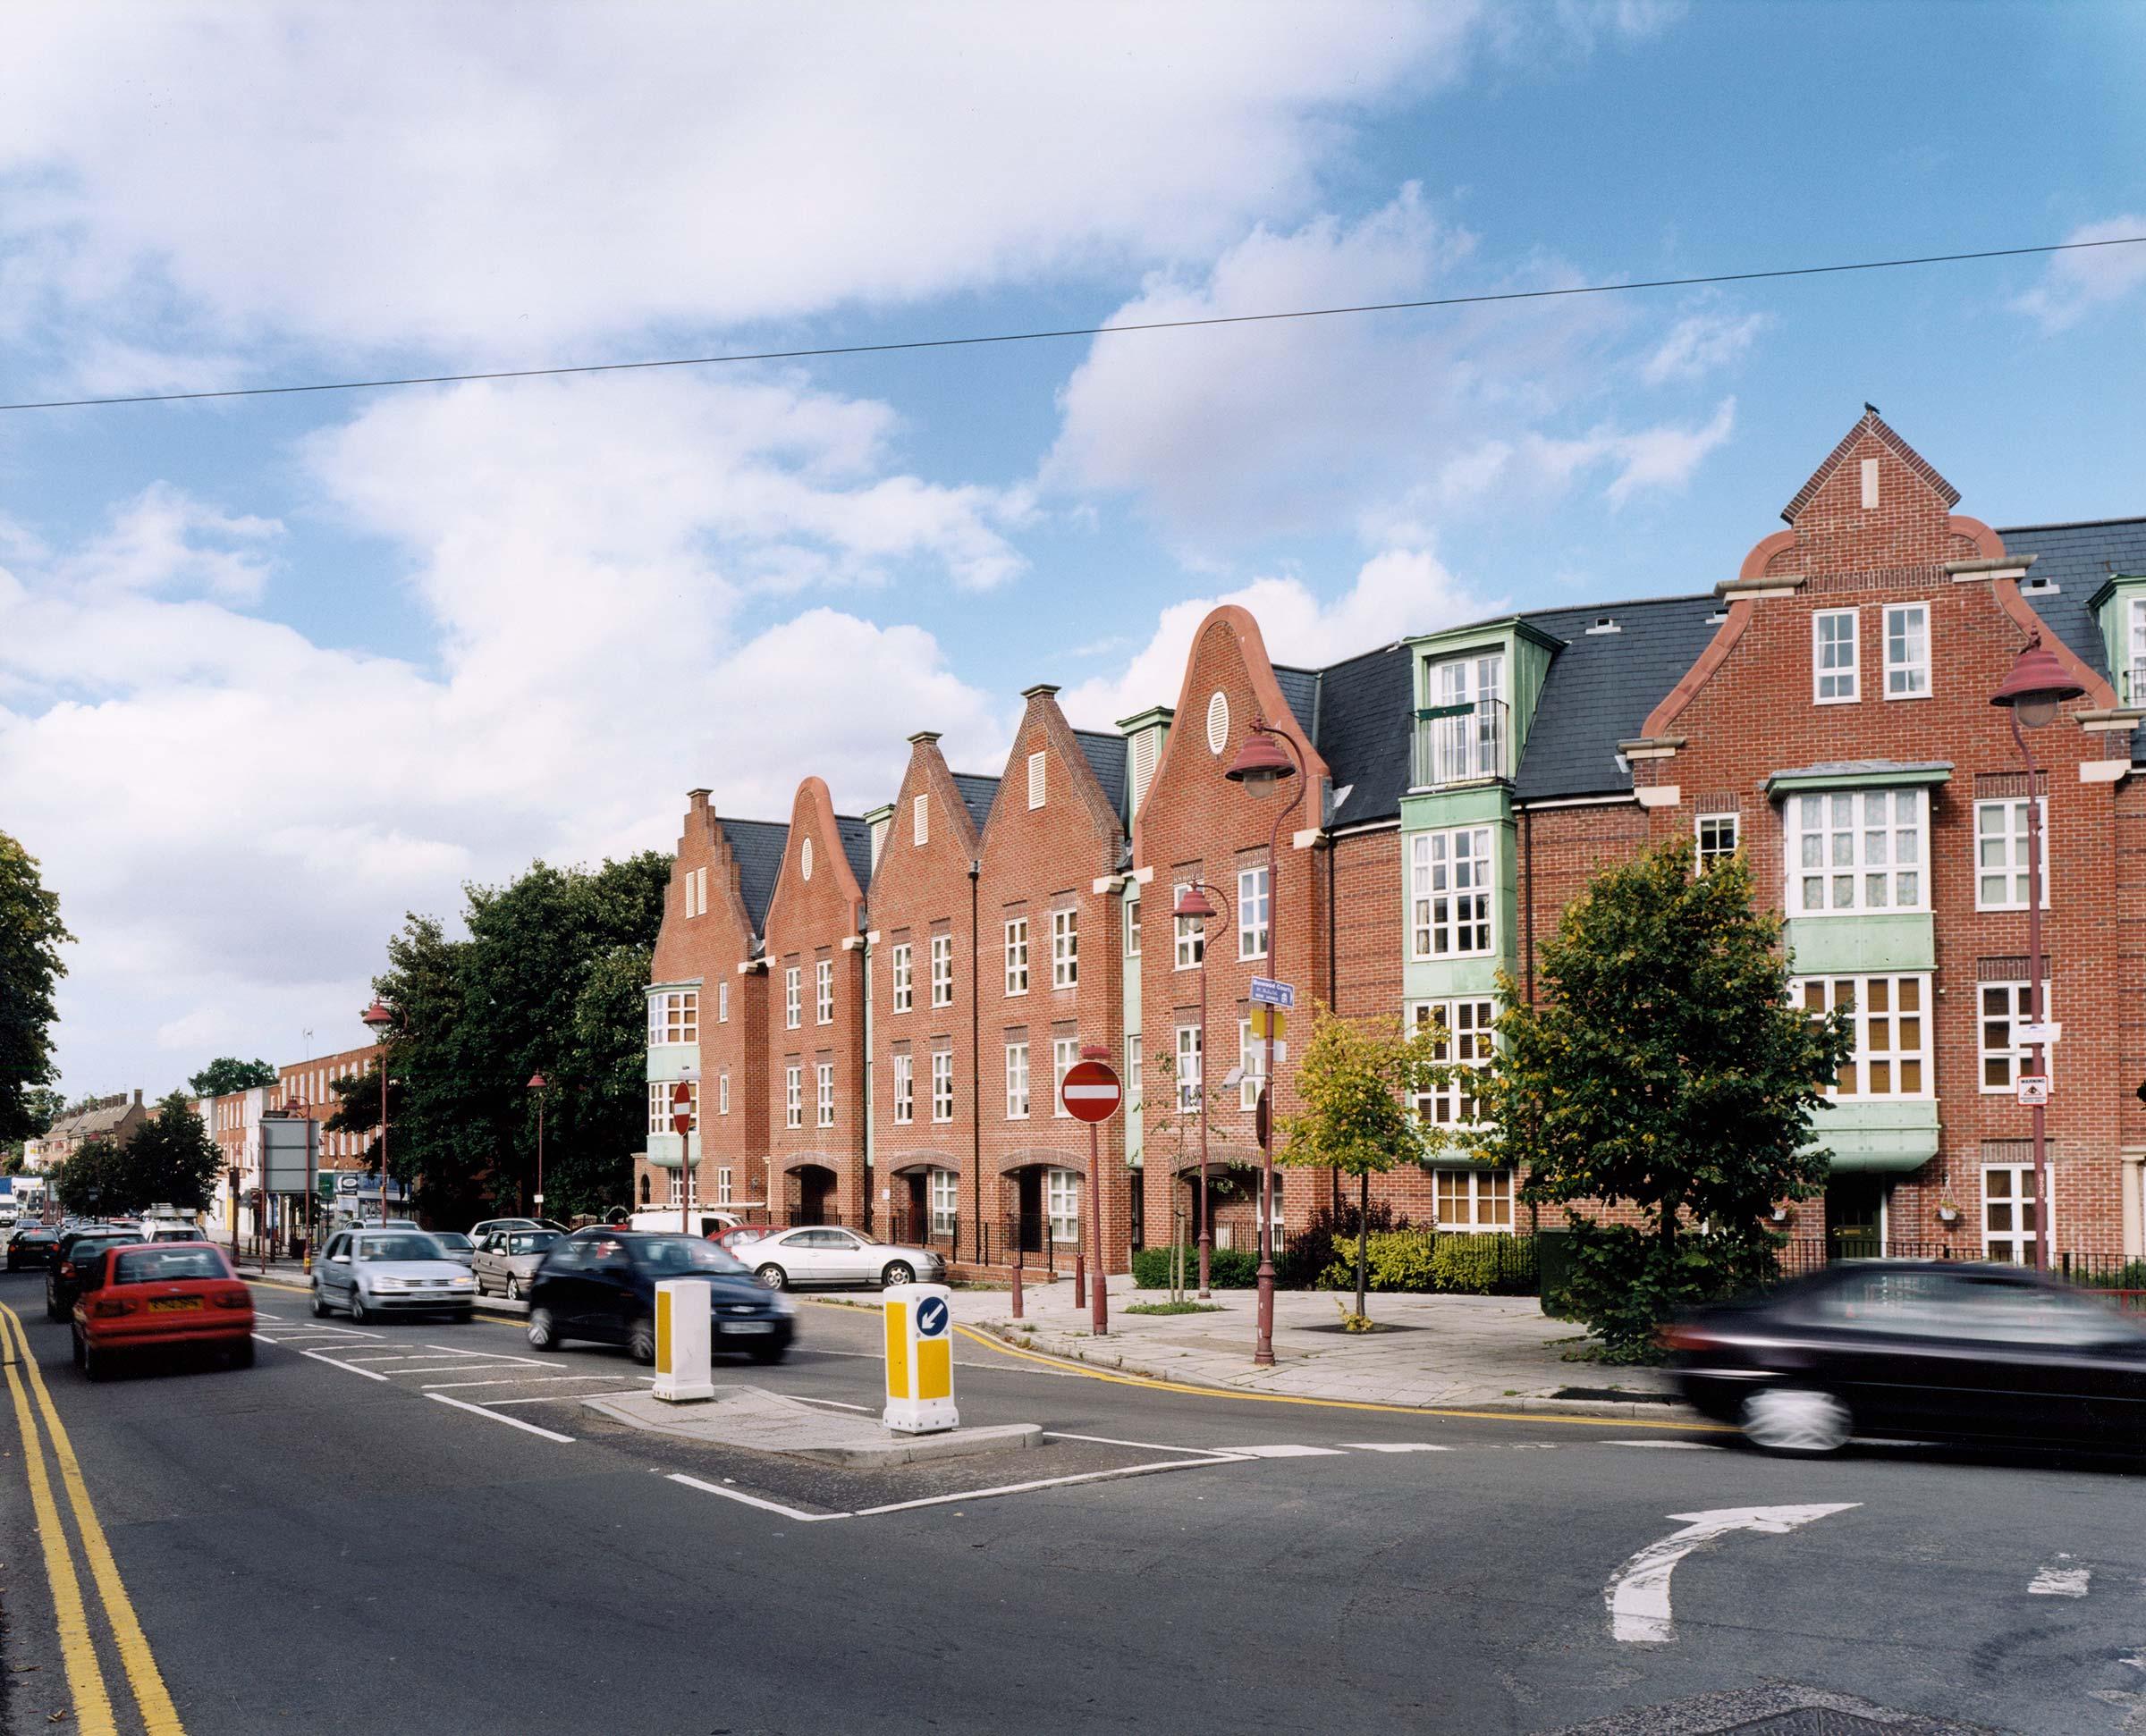 Urban development at Radlett, Hertfordshire